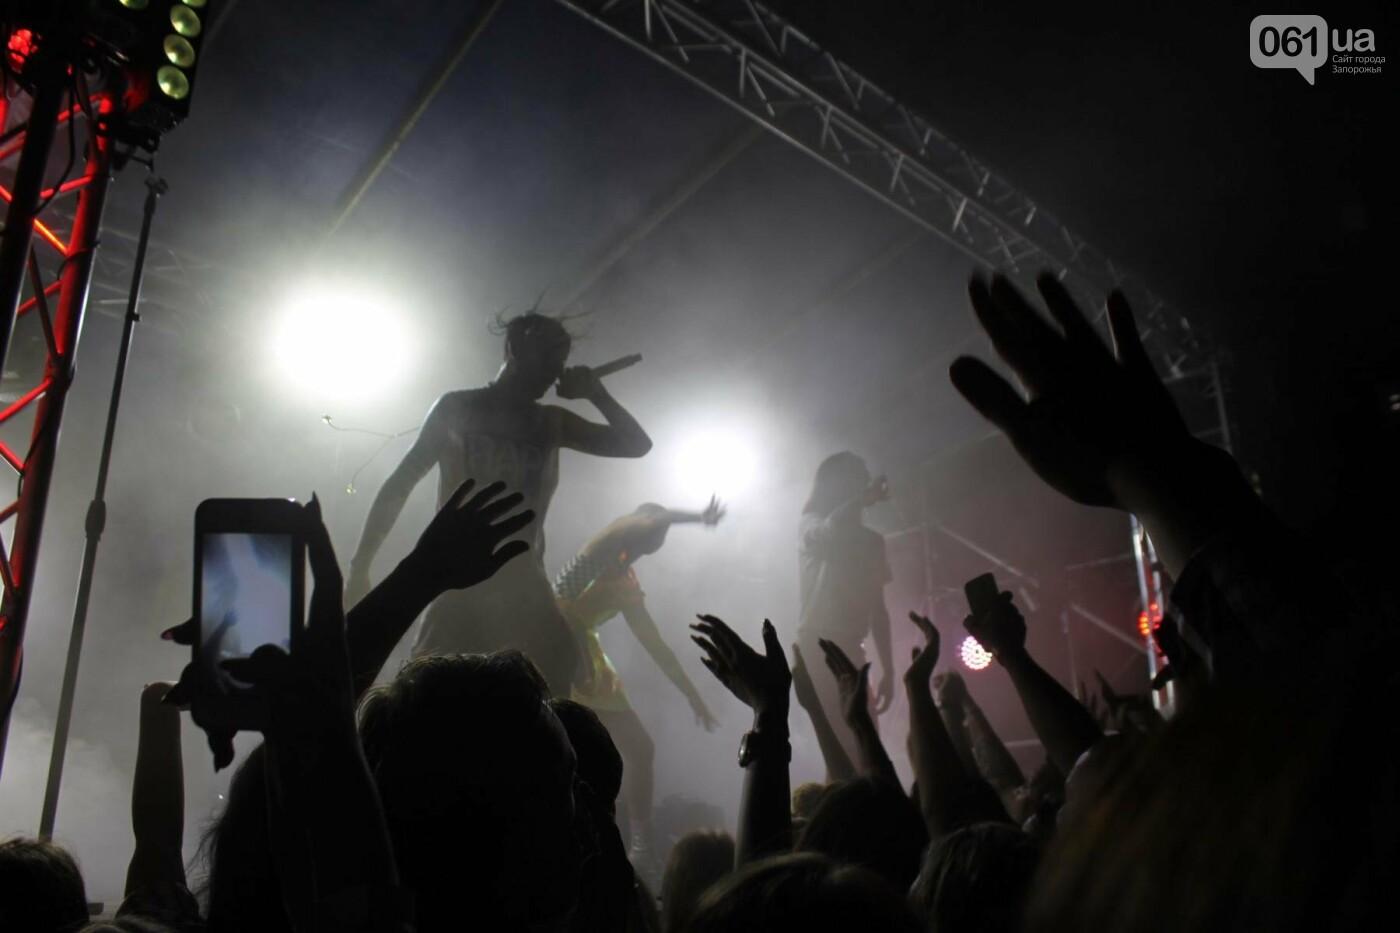 ALEKSEEV, «Агонь» и MamaRika: в Запорожье звезды устроили яркий концерт на «Miss AVRORA Summer 2018», – ФОТОРЕПОРТАЖ, фото-14